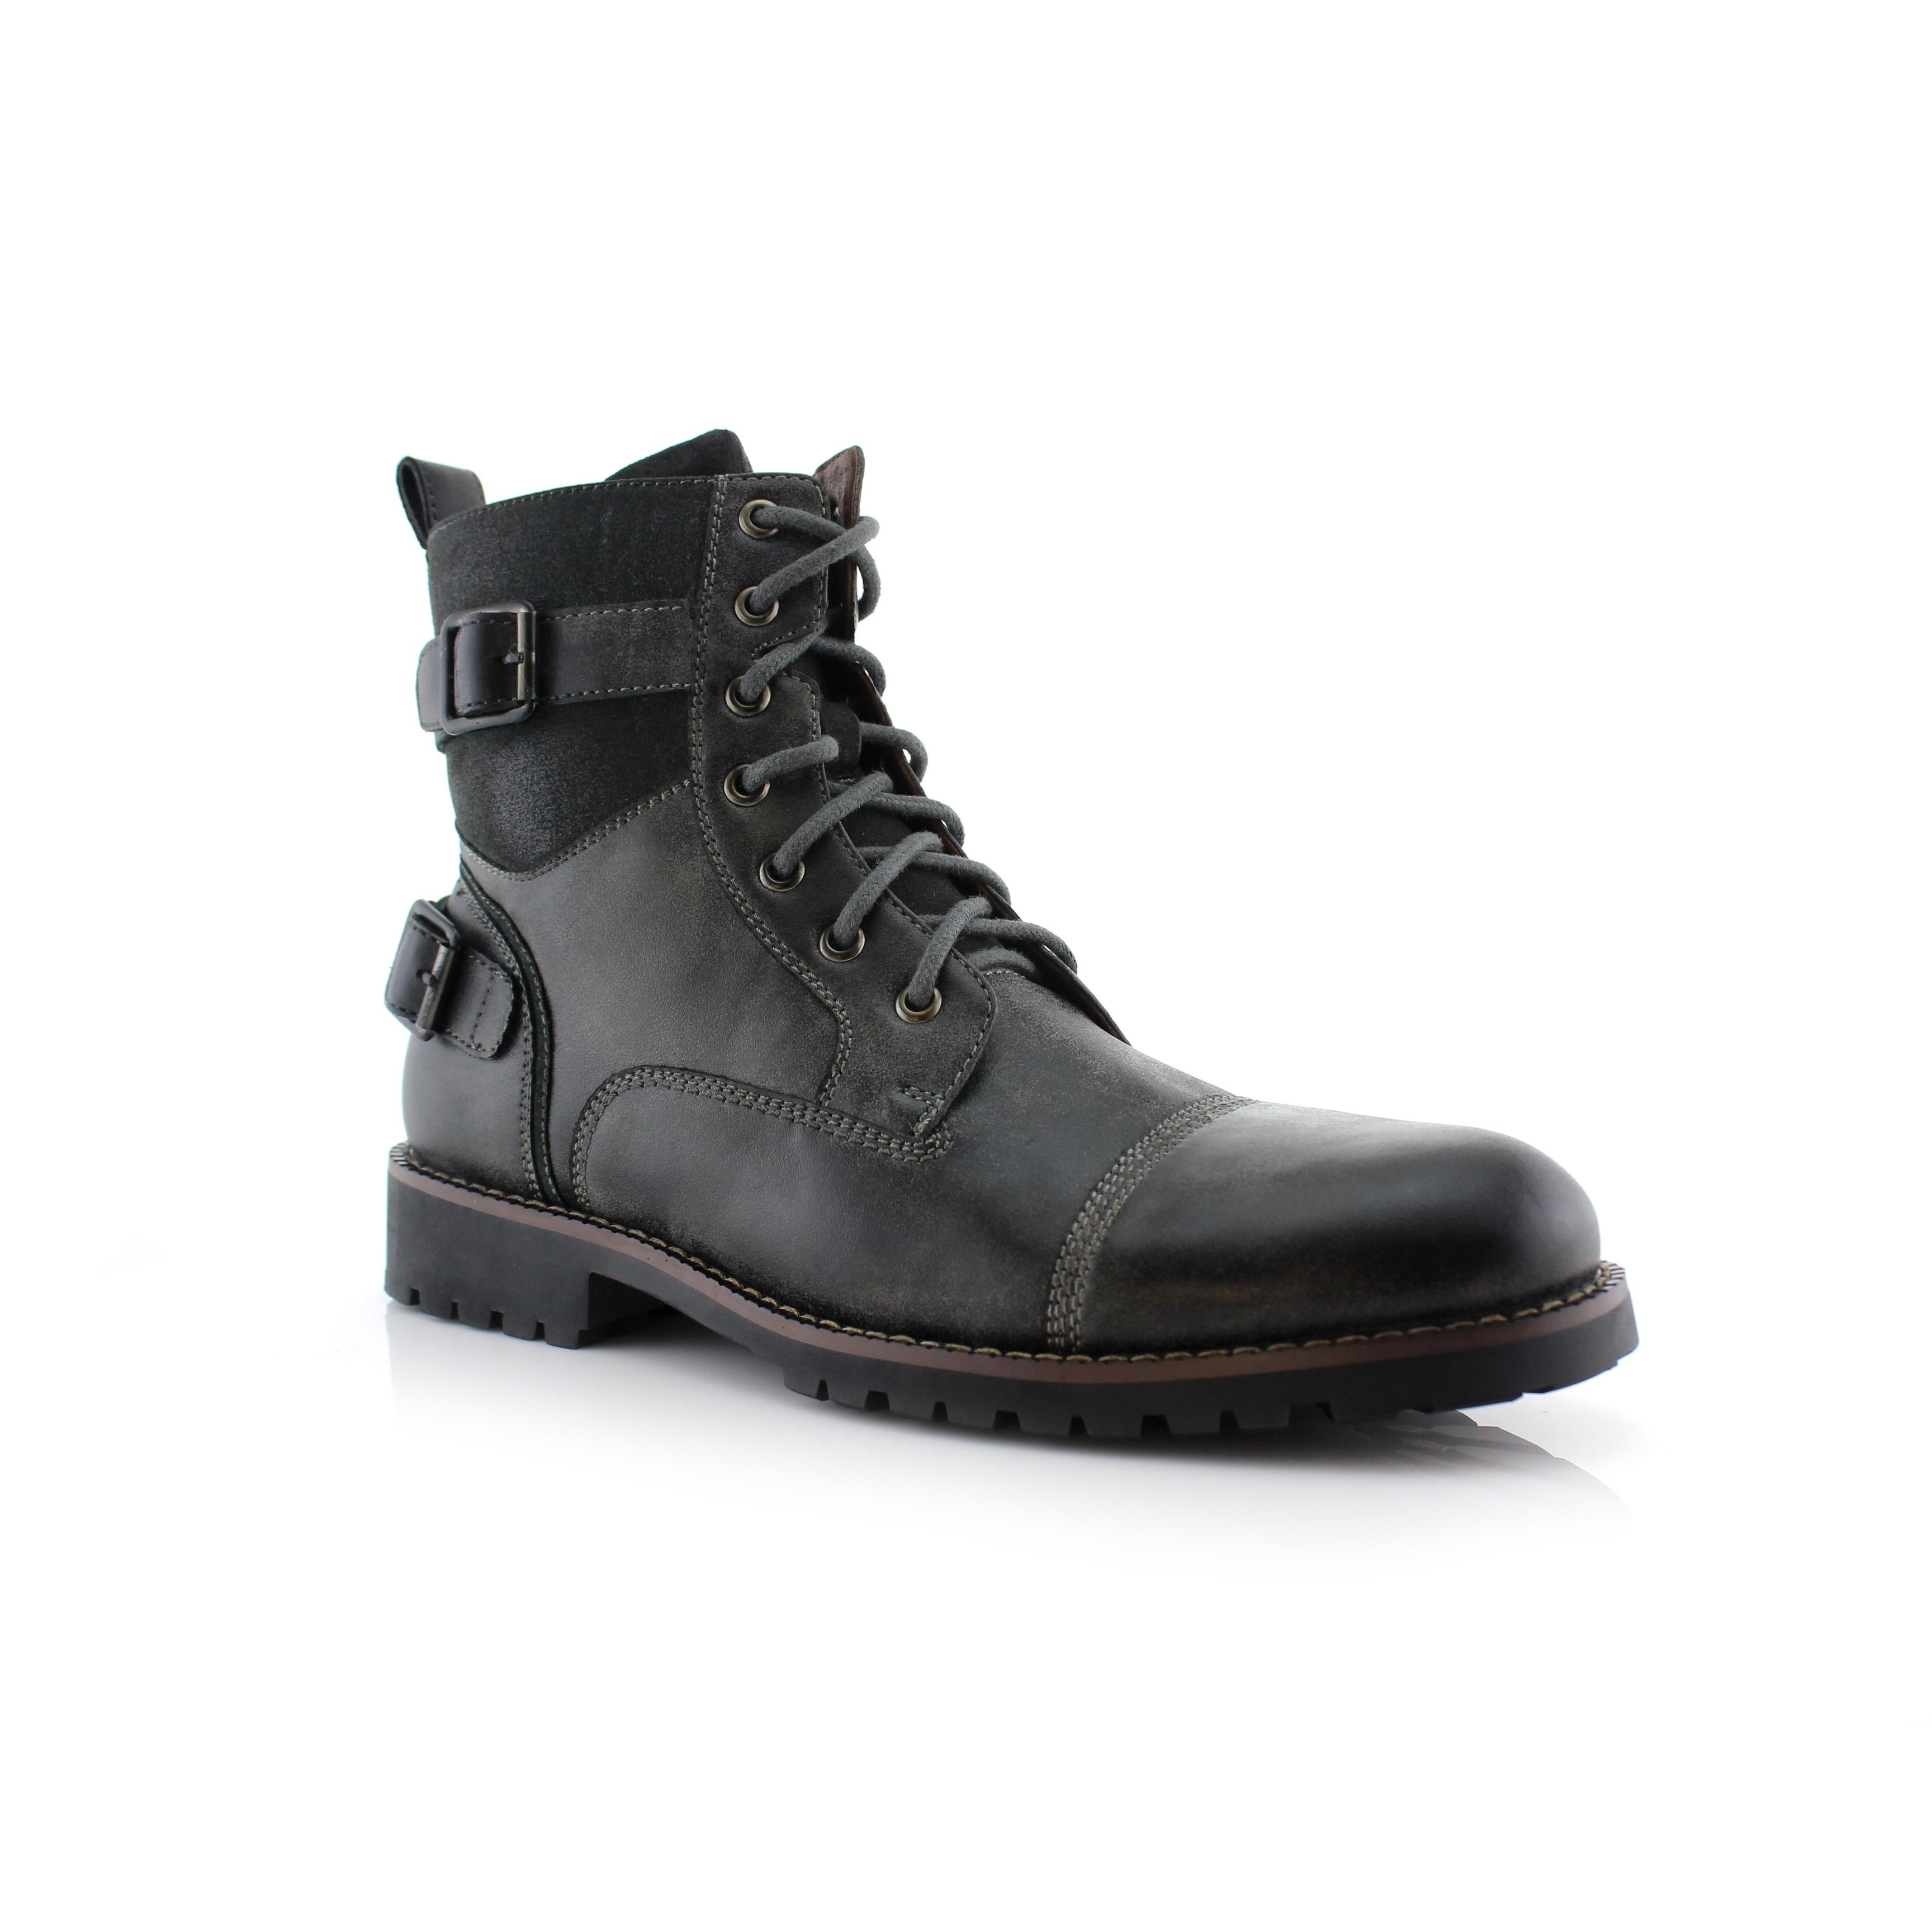 Boots Men